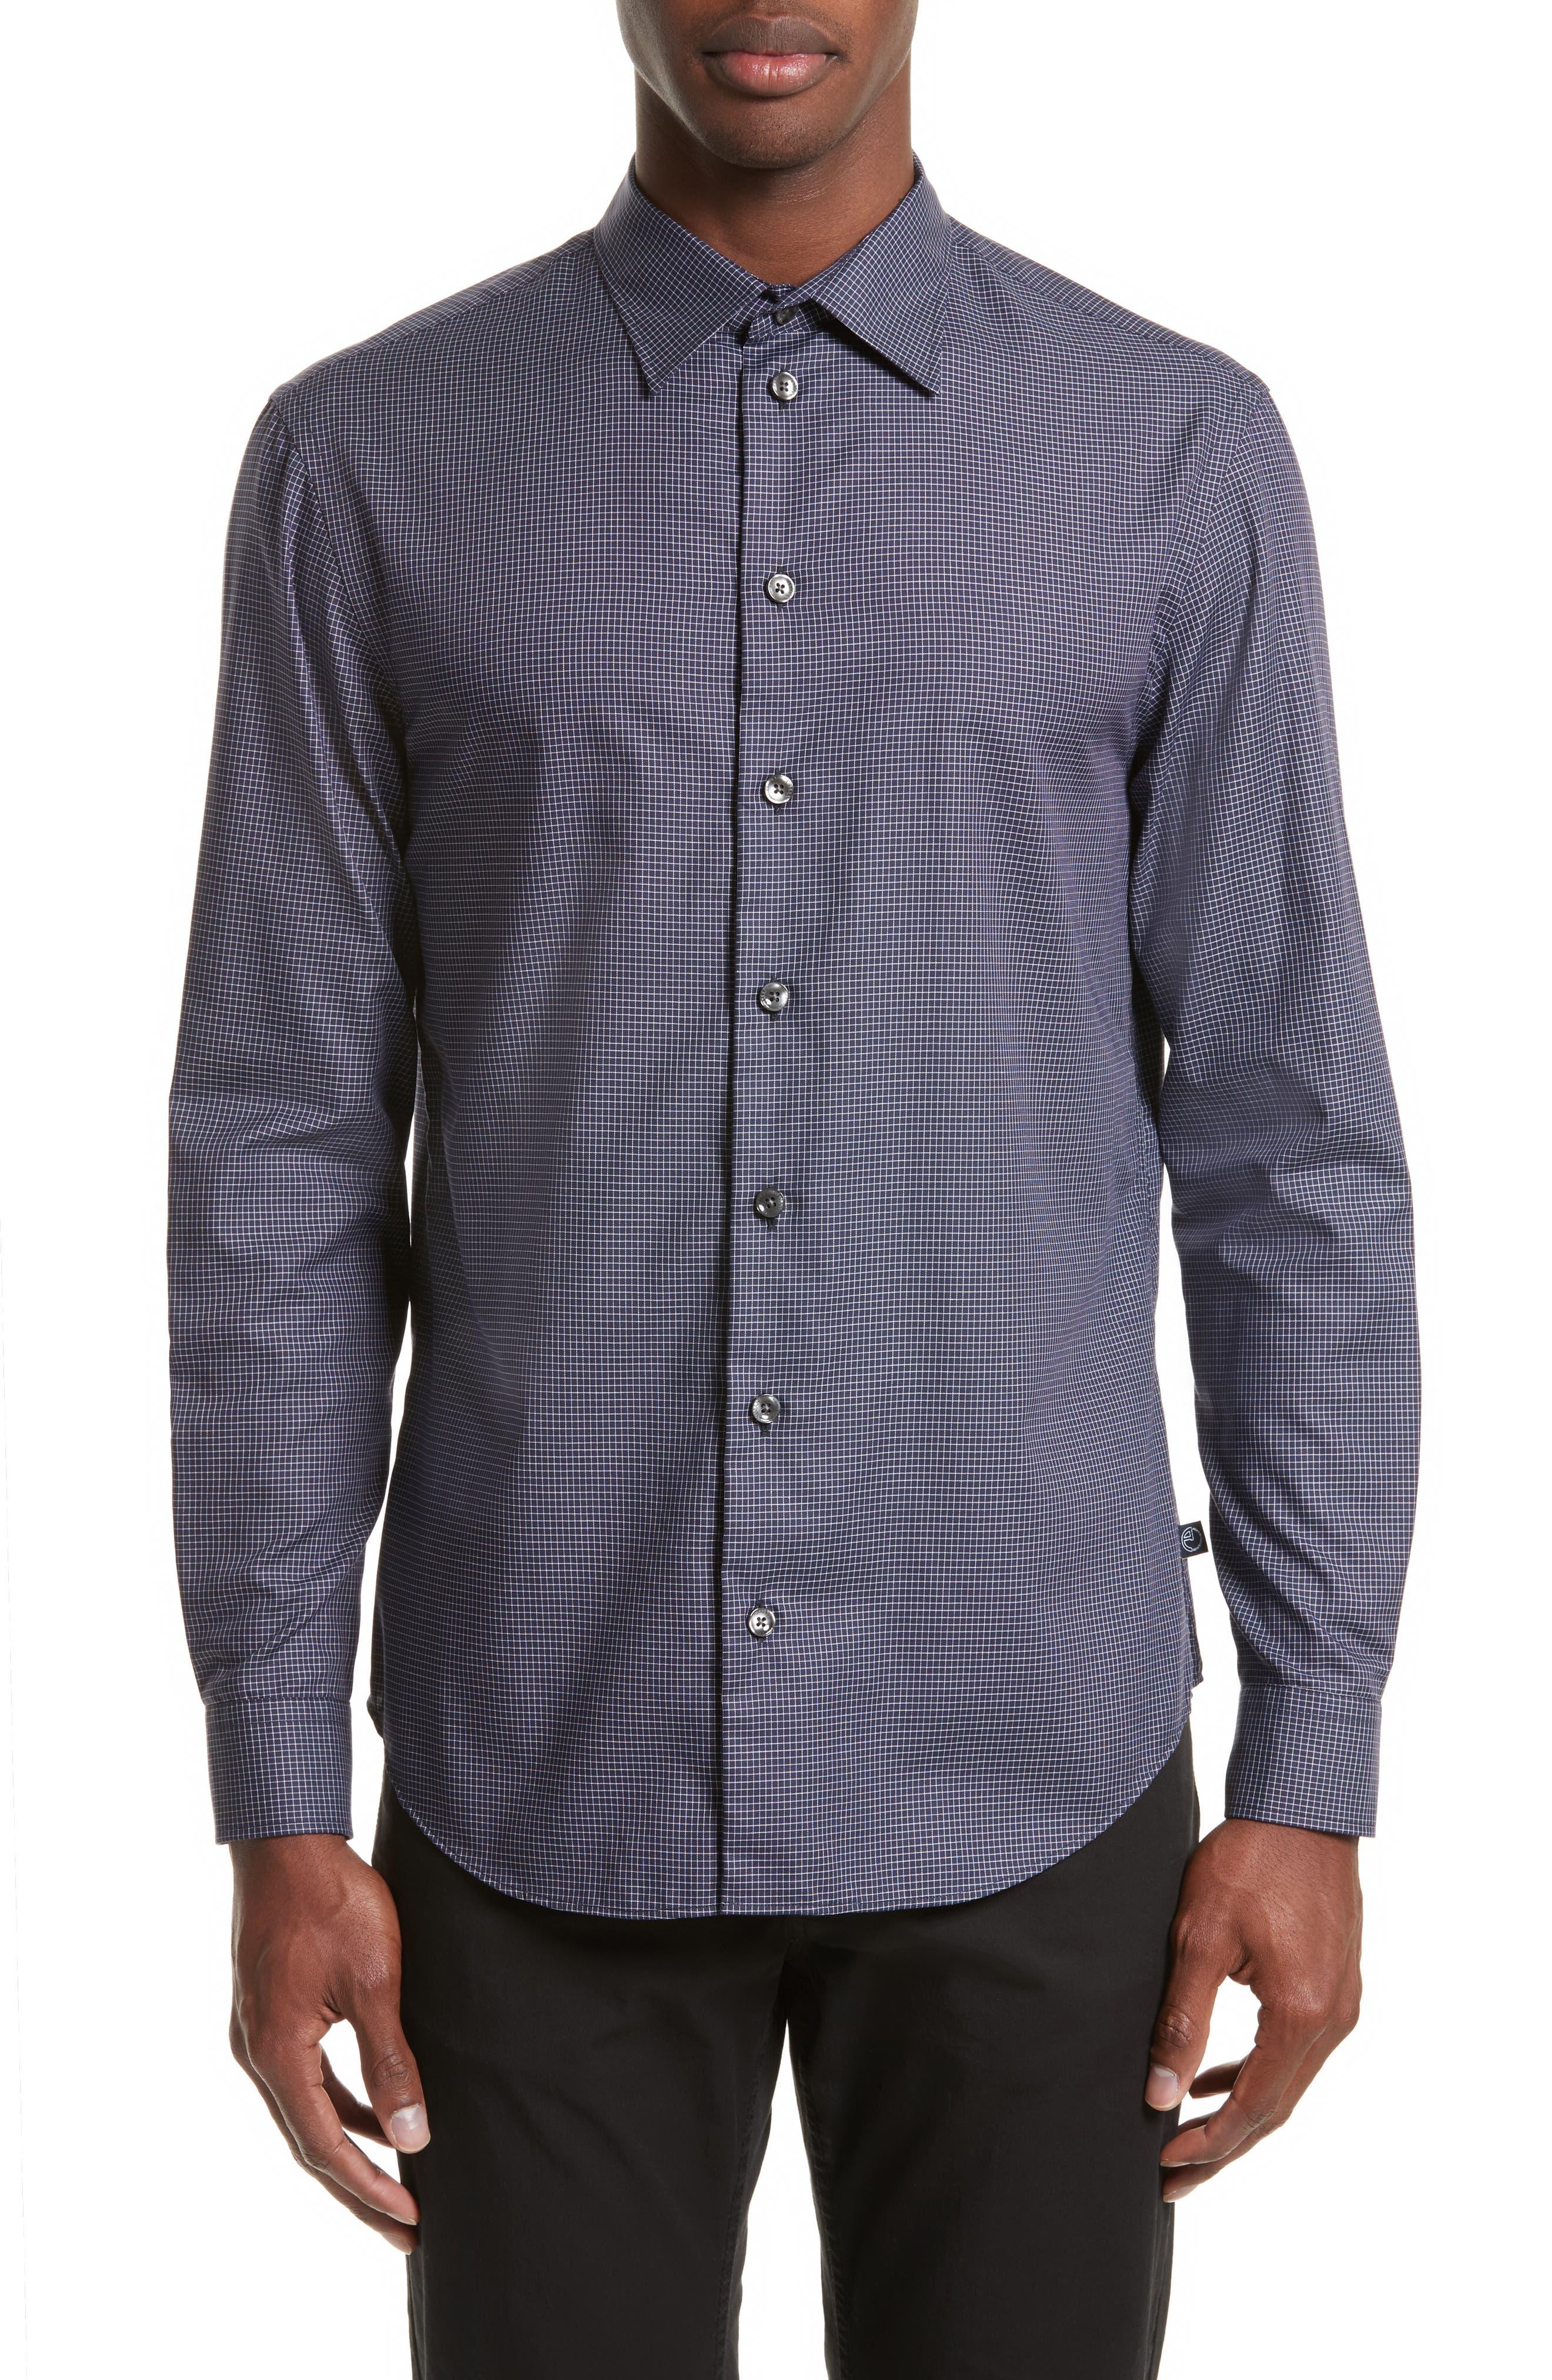 Main Image - Armani Collezioni Slim Fit Grid Print Sport Shirt